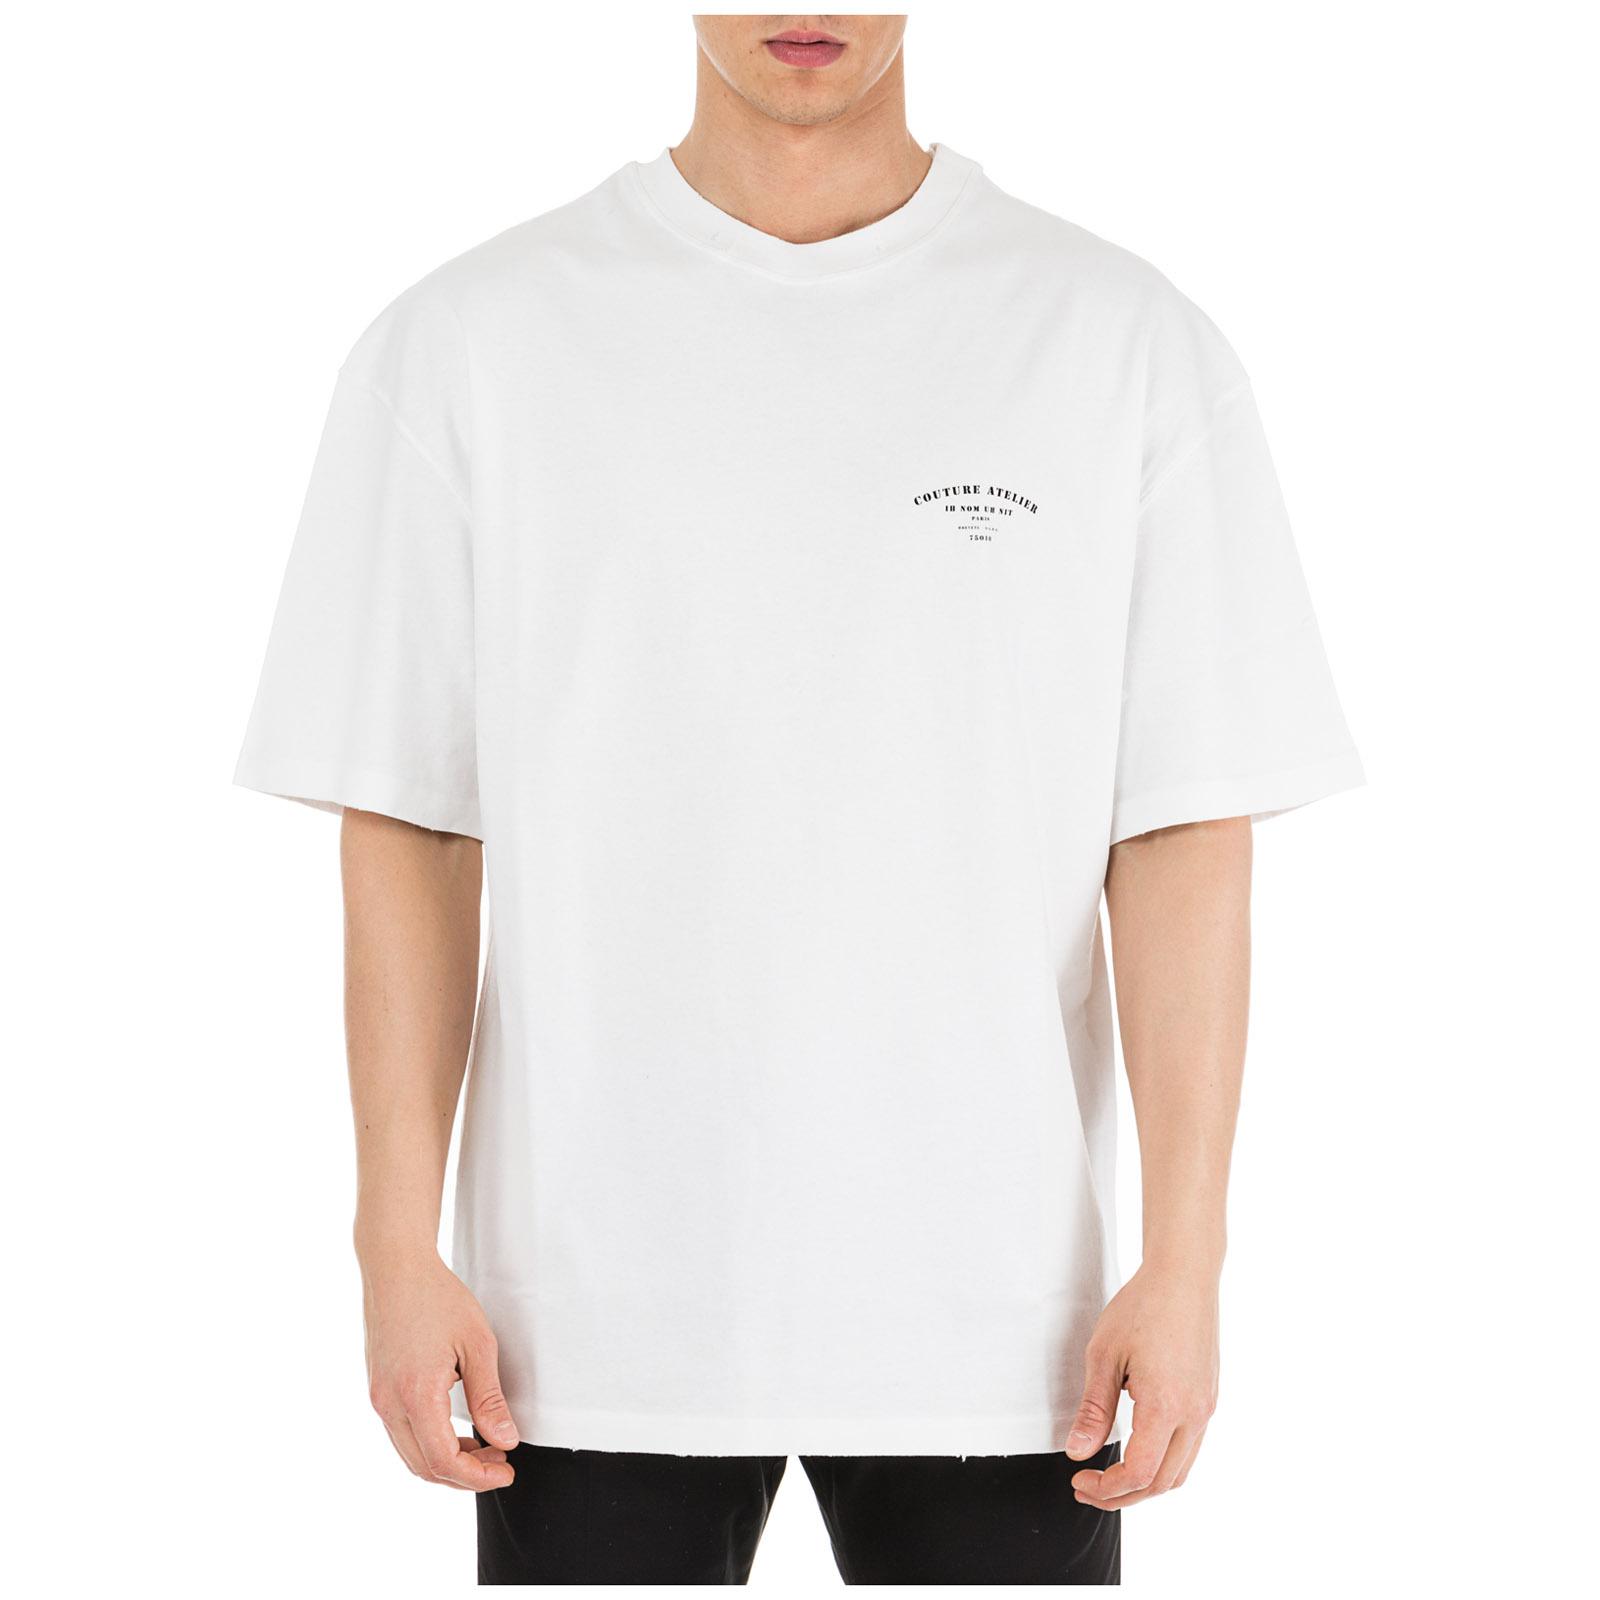 ac853d3a Men's short sleeve t-shirt crew neckline jumper couture atelier